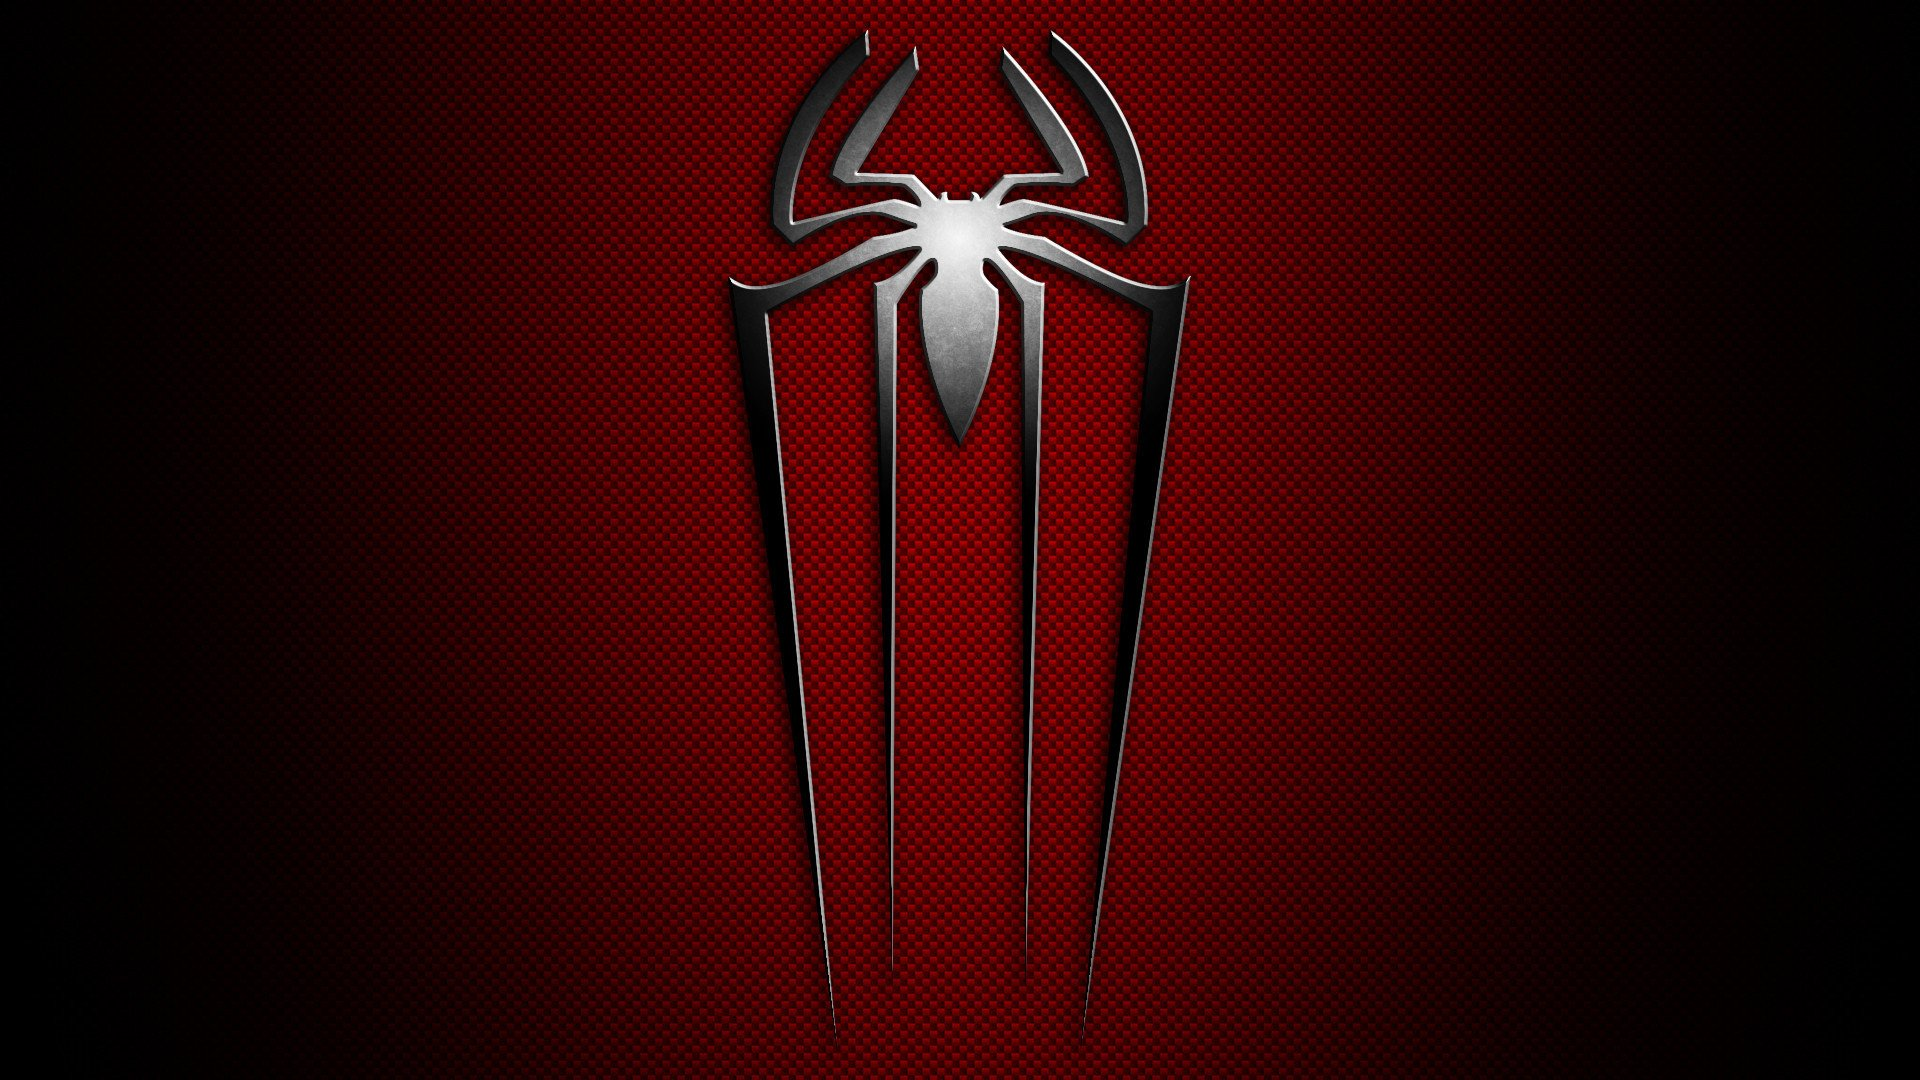 Spiderman Logo Wallpaper WallpaperTag 1920x1080